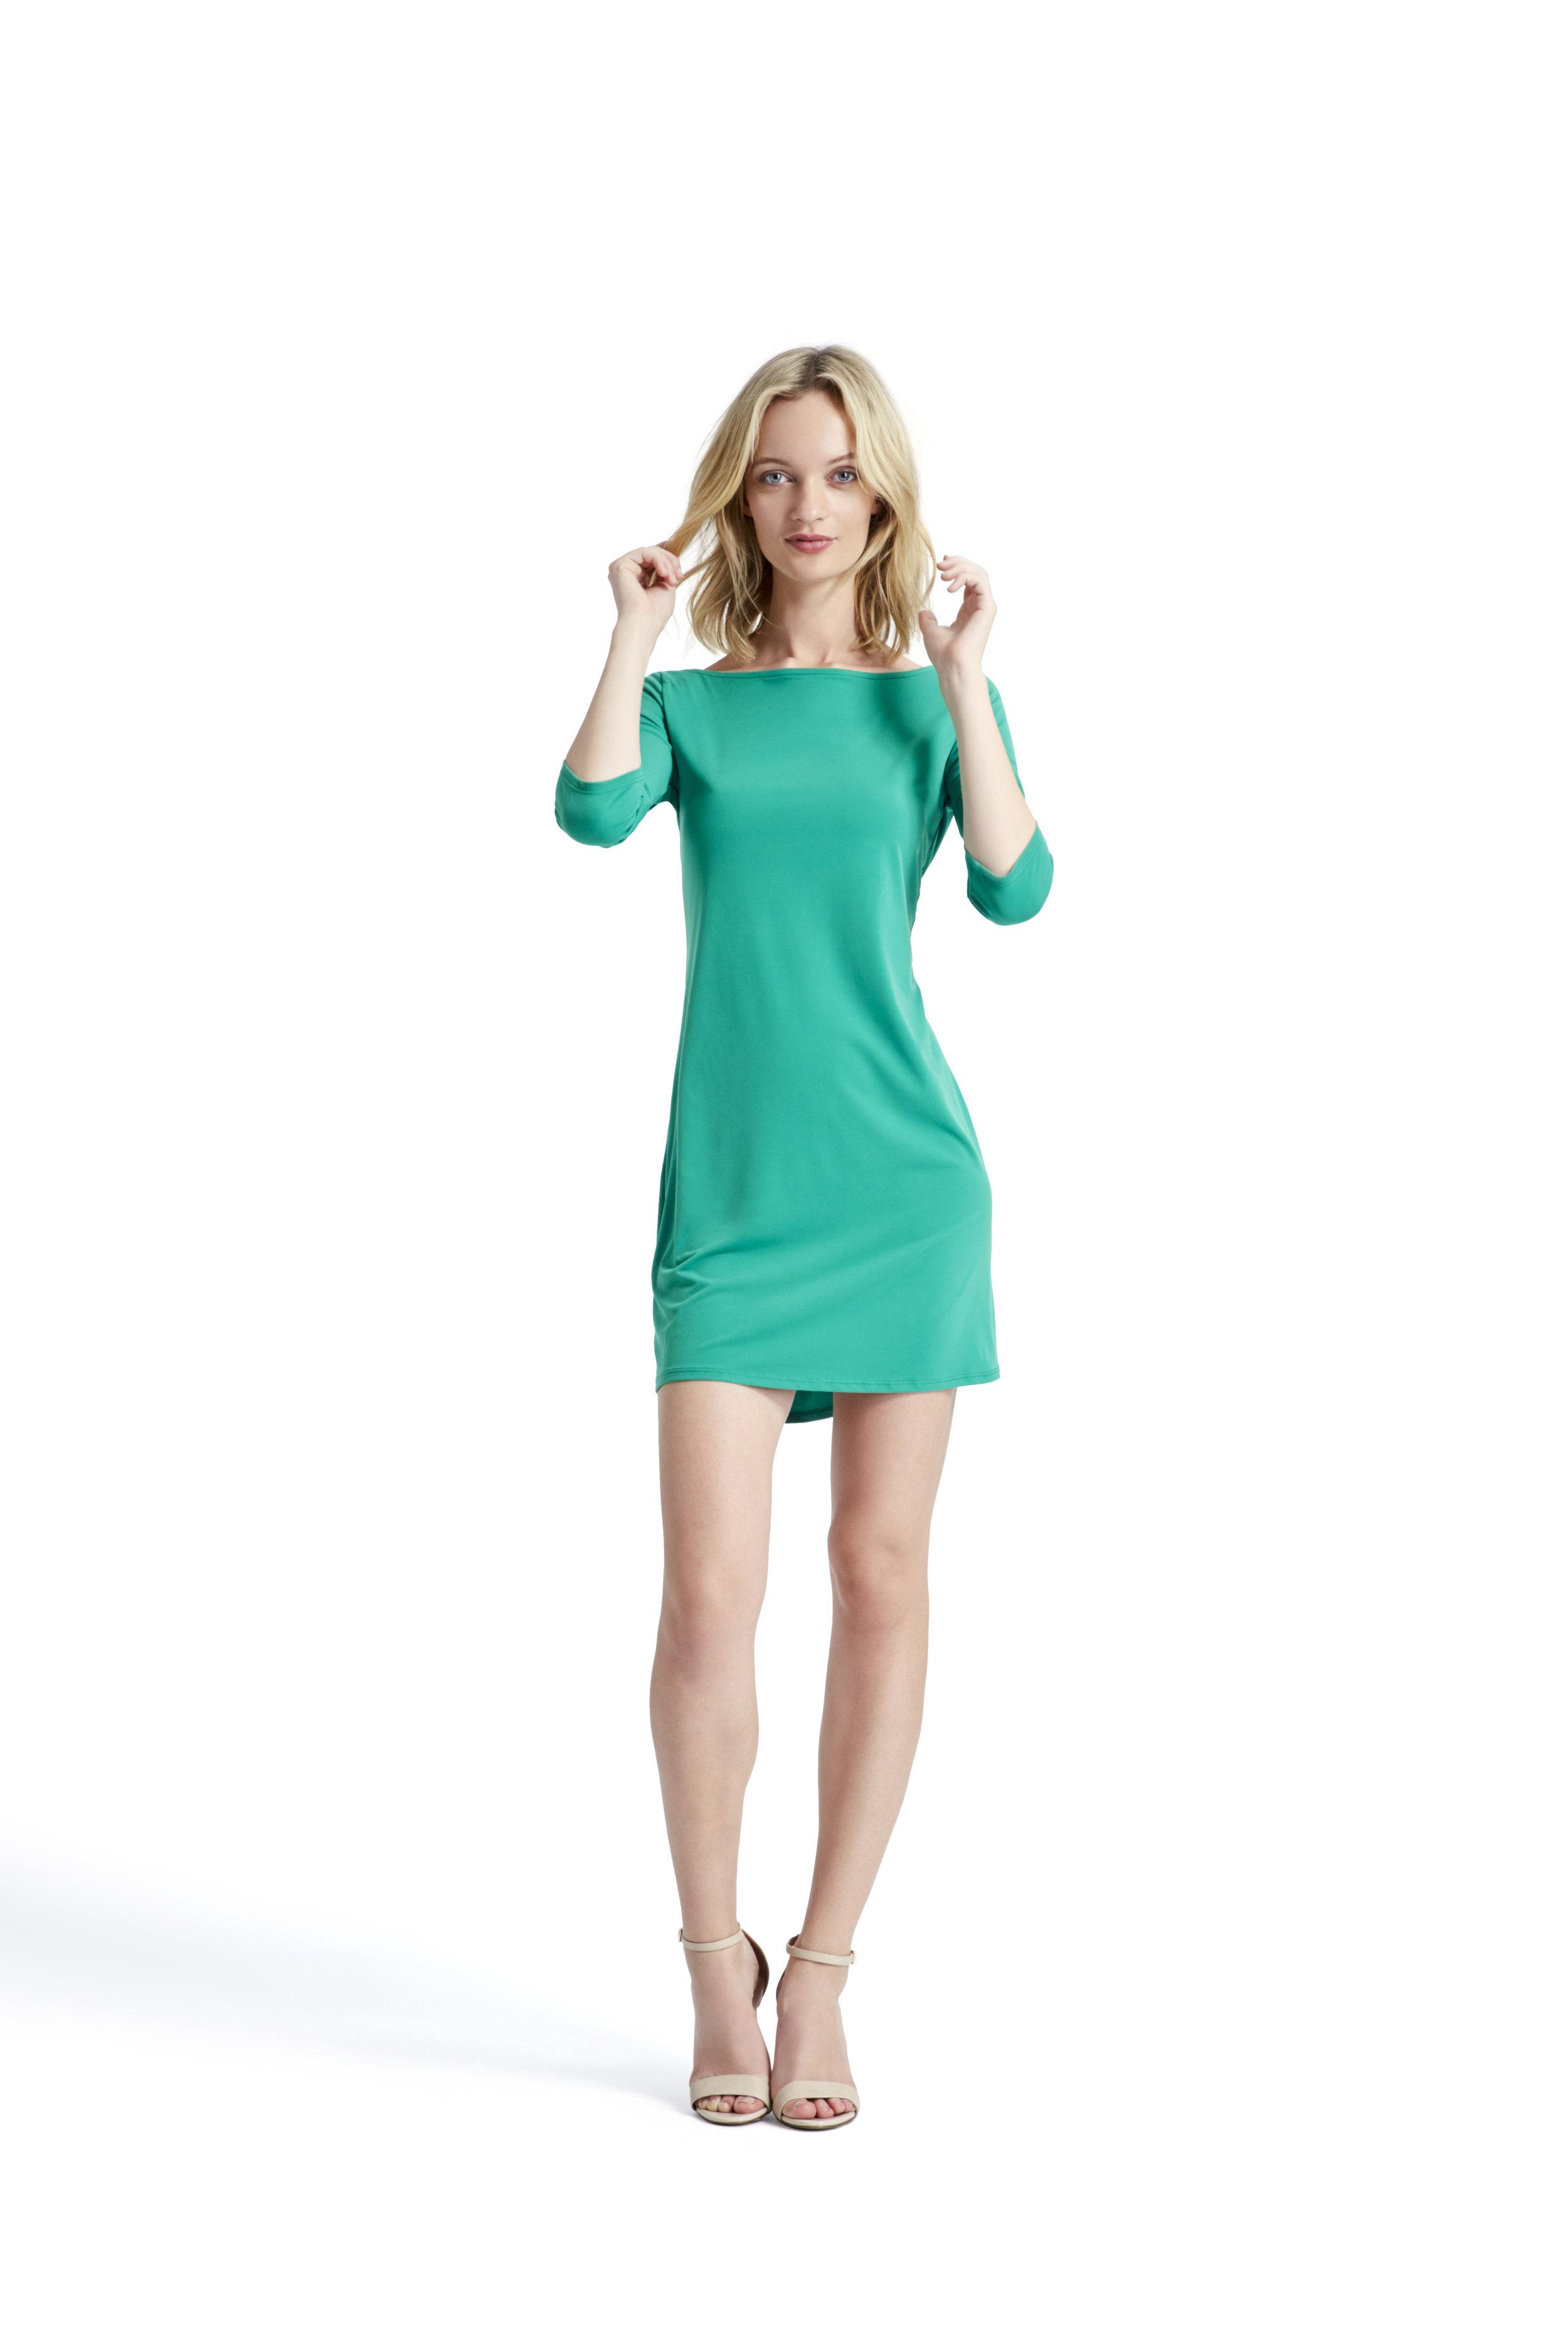 dress_before.jpg